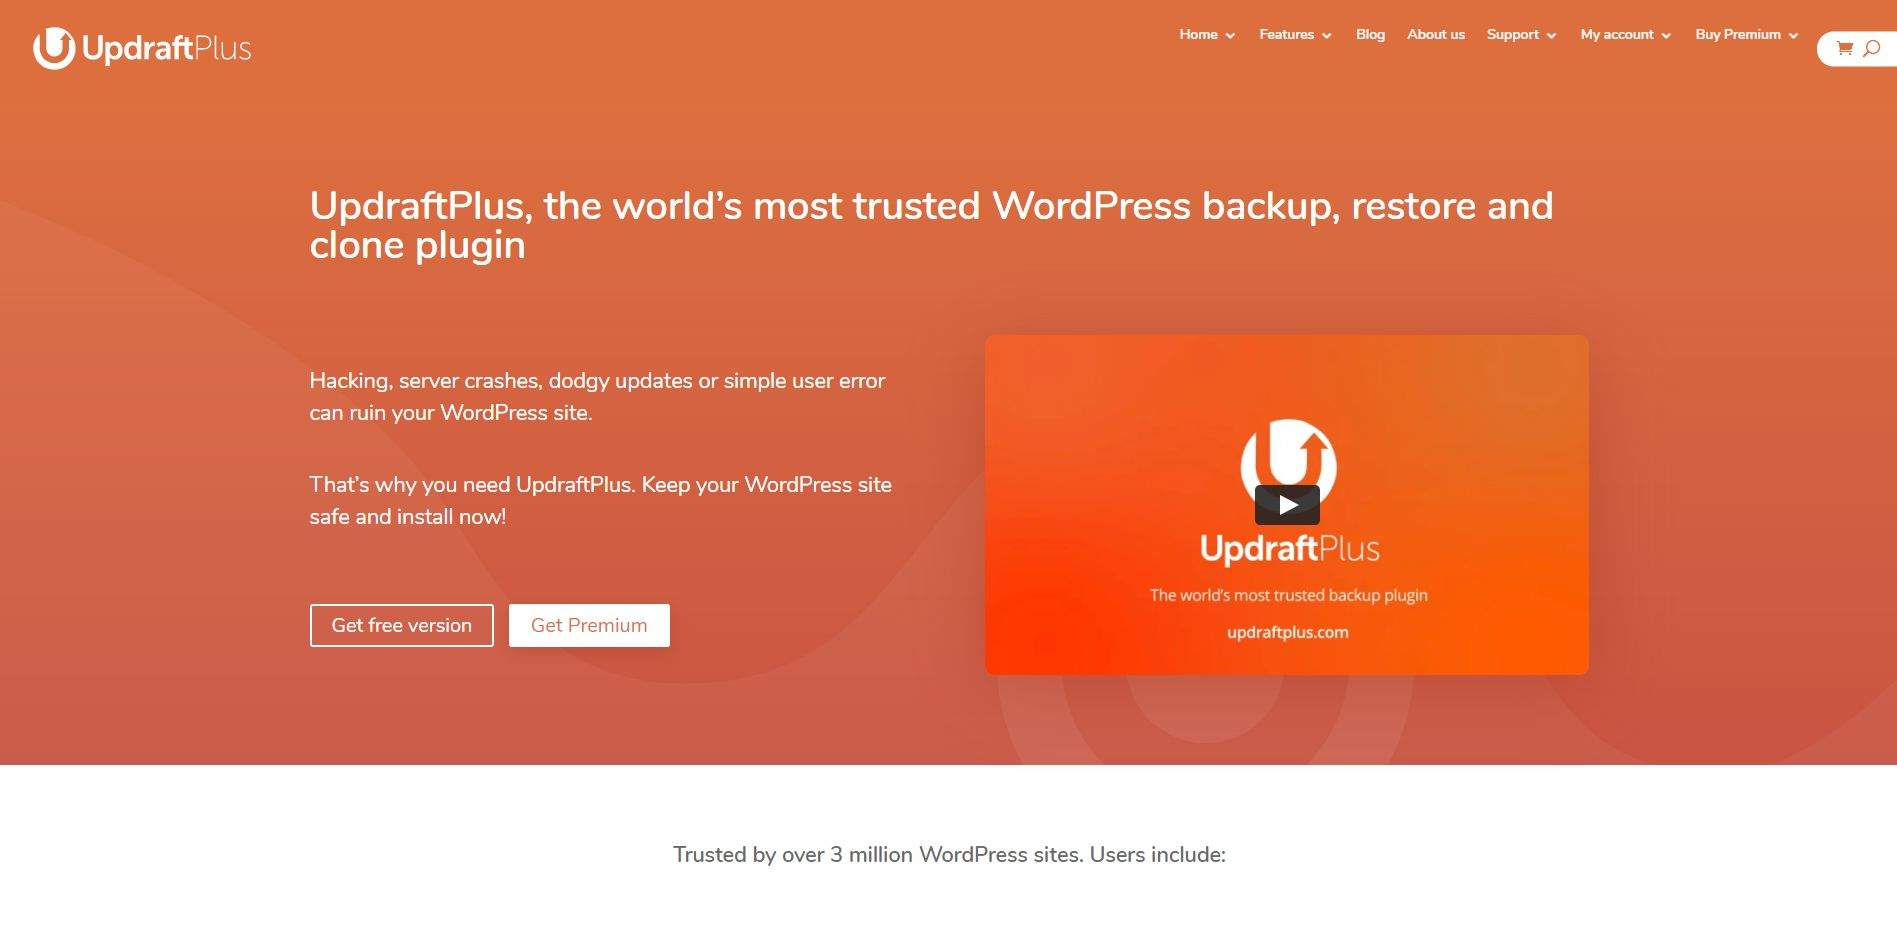 Wordpress Plugin Komma99 UpdraftPlus